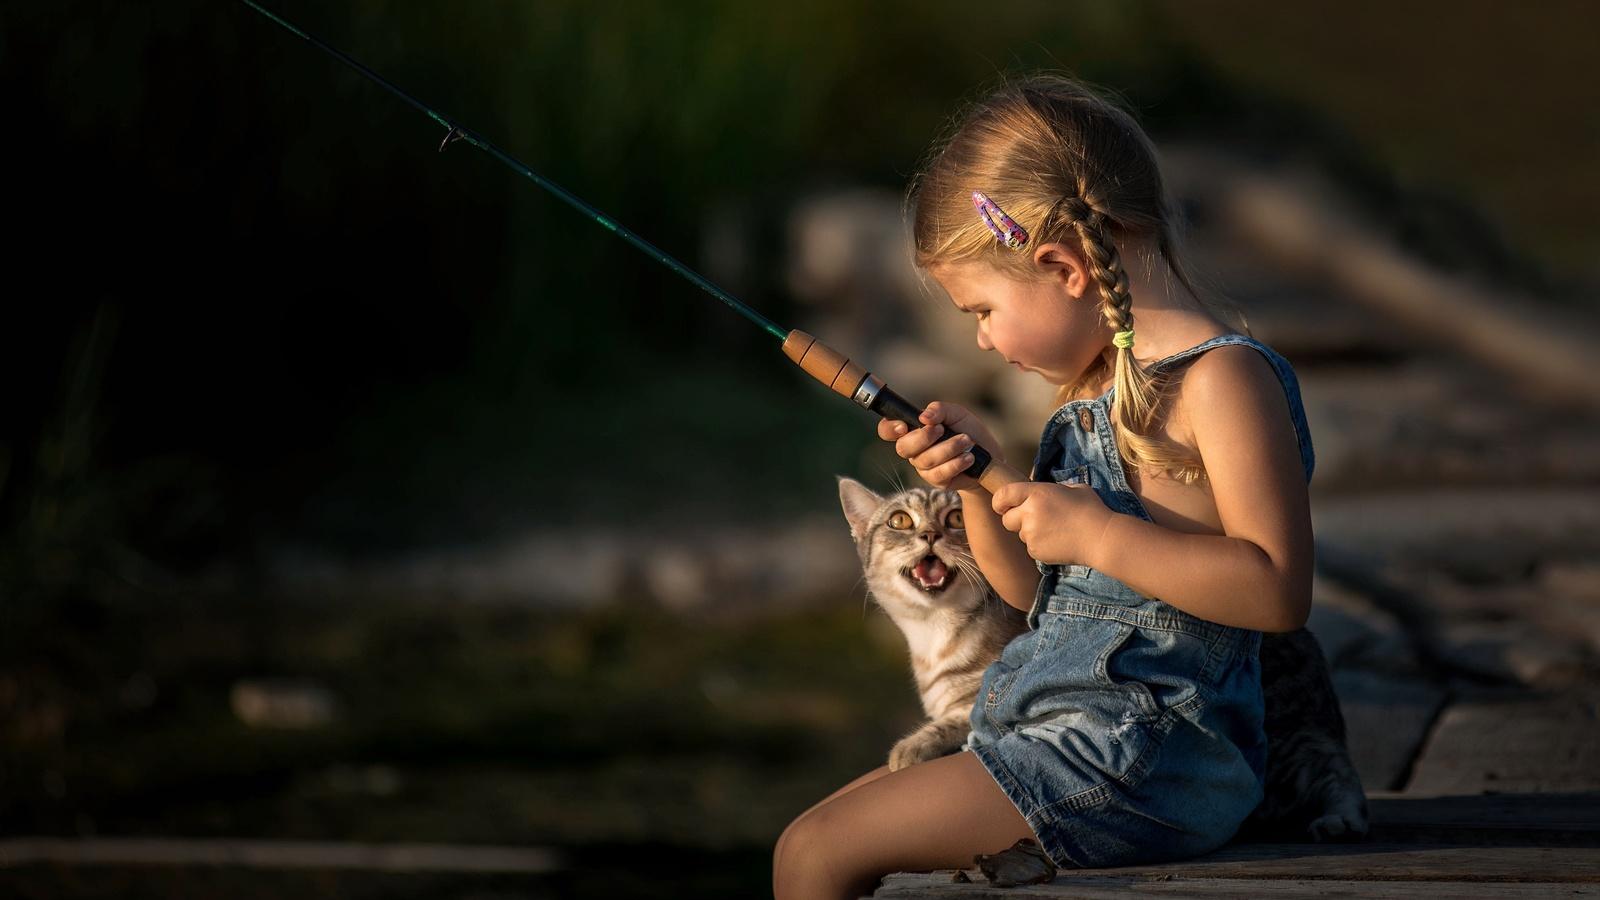 девочка, ребенок, кот, фото, позитив, рыбалка